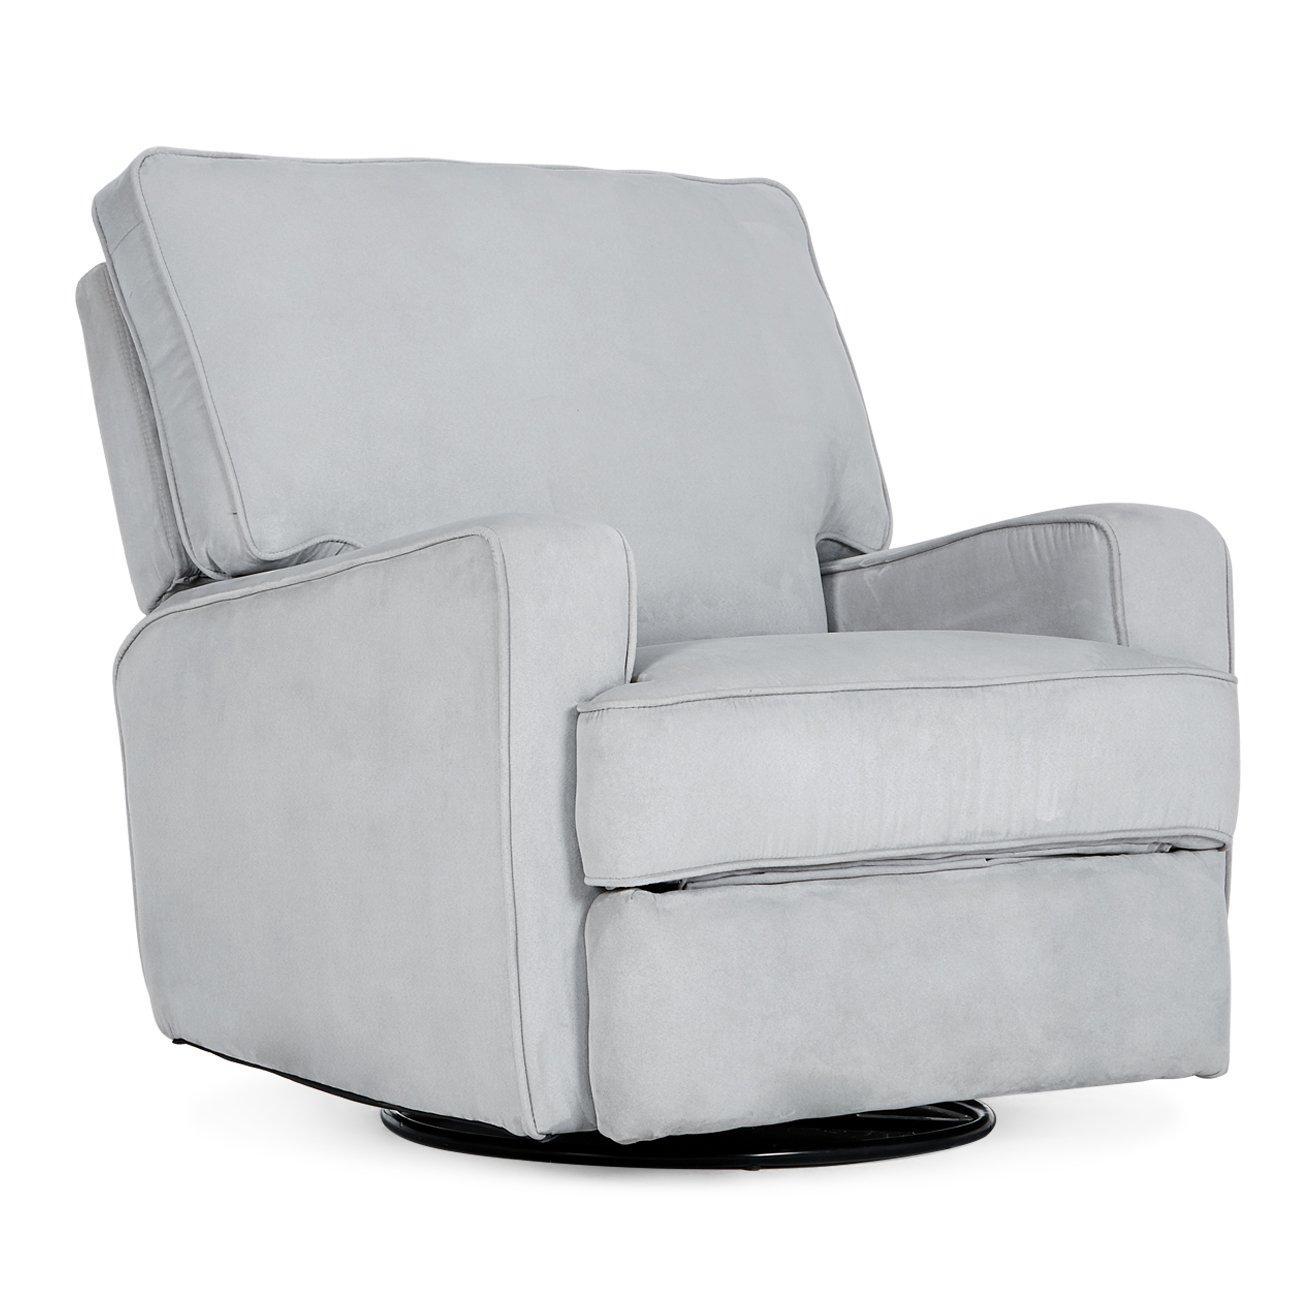 Amazon com belleze recliner chair padded armrest backrest living room swivel reclining chairs comfort footrest linen gray kitchen dining